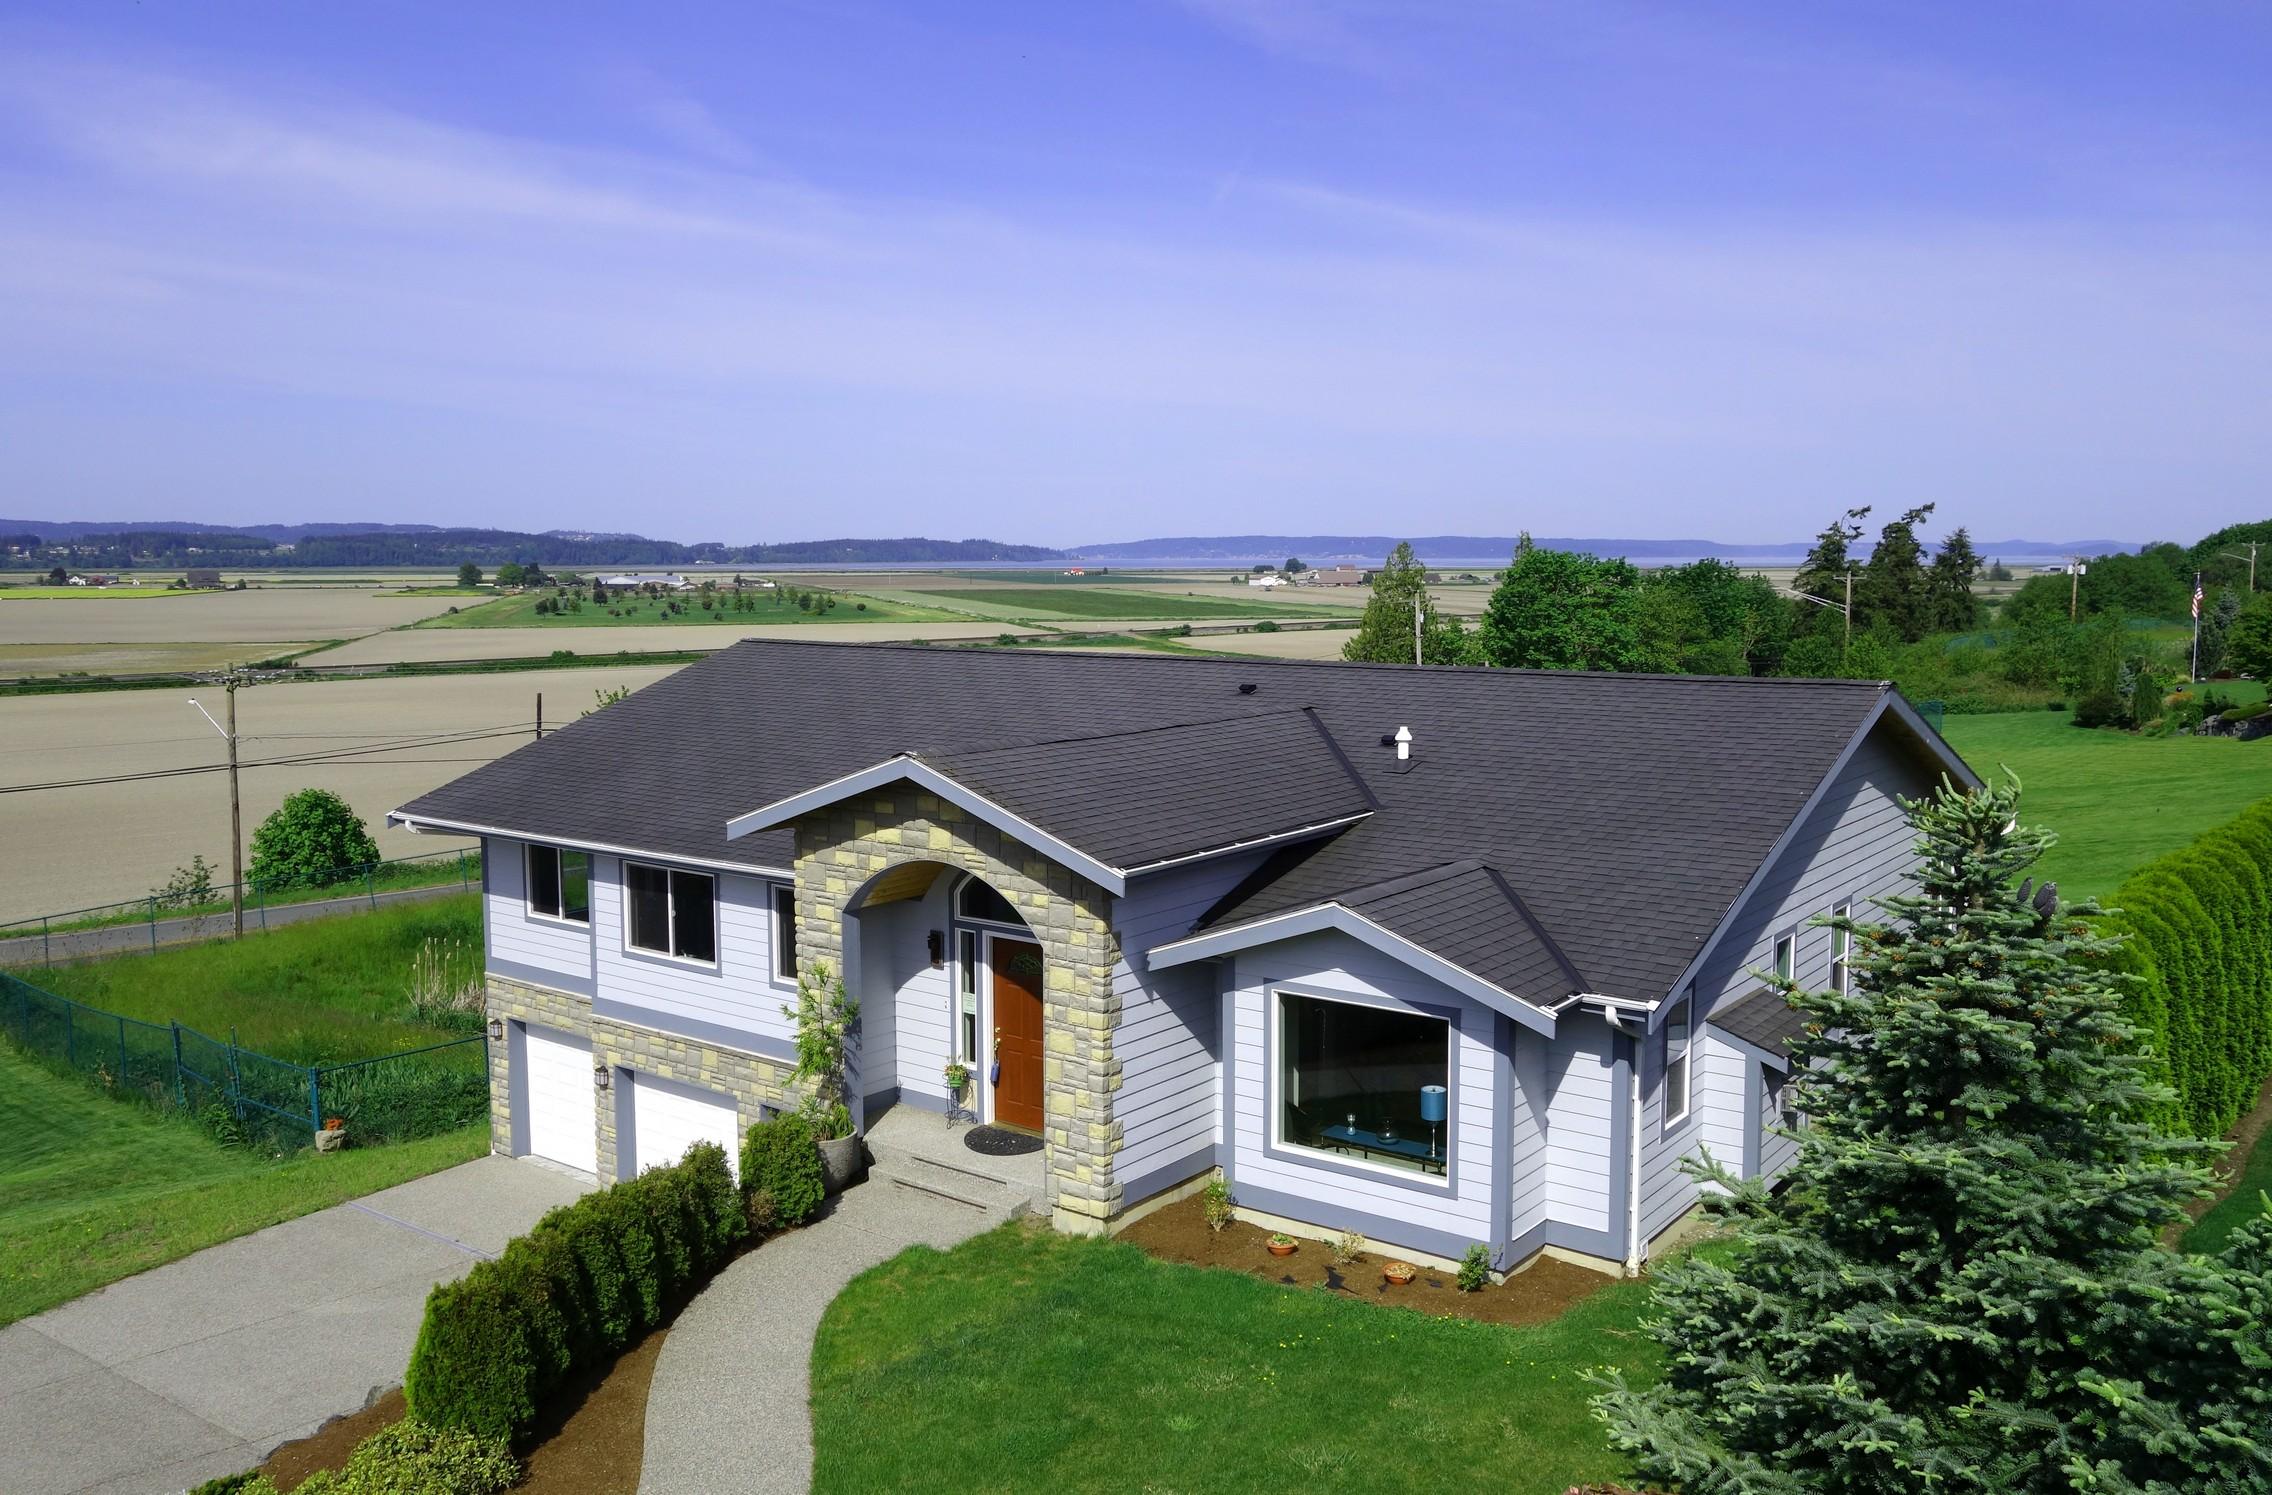 獨棟家庭住宅 為 出售 在 Custom Panoramic View 8704 Nordic Way Stanwood, 華盛頓州 98292 美國